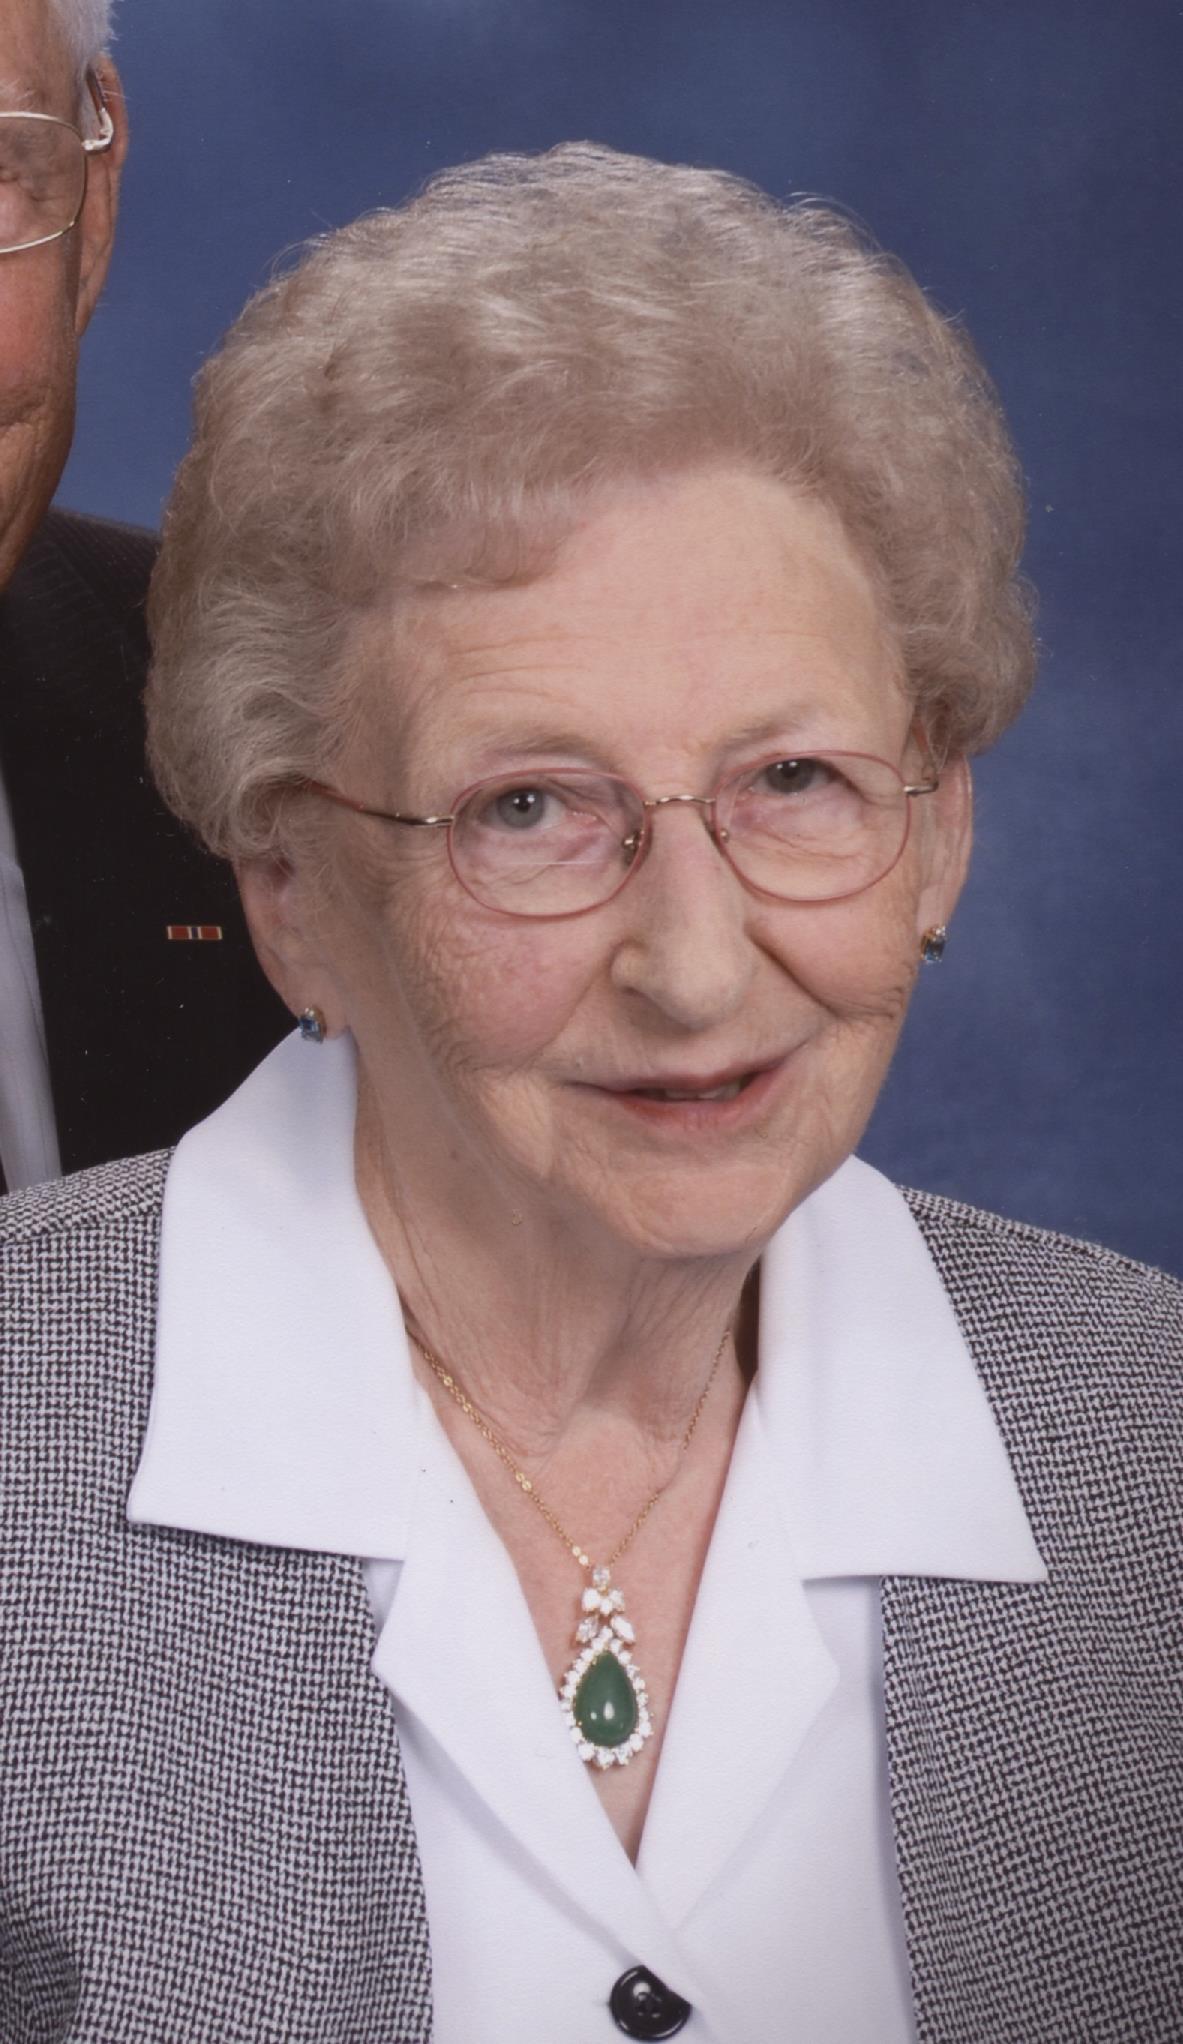 Laurabell S. Reller, age 87, of Huntingburg